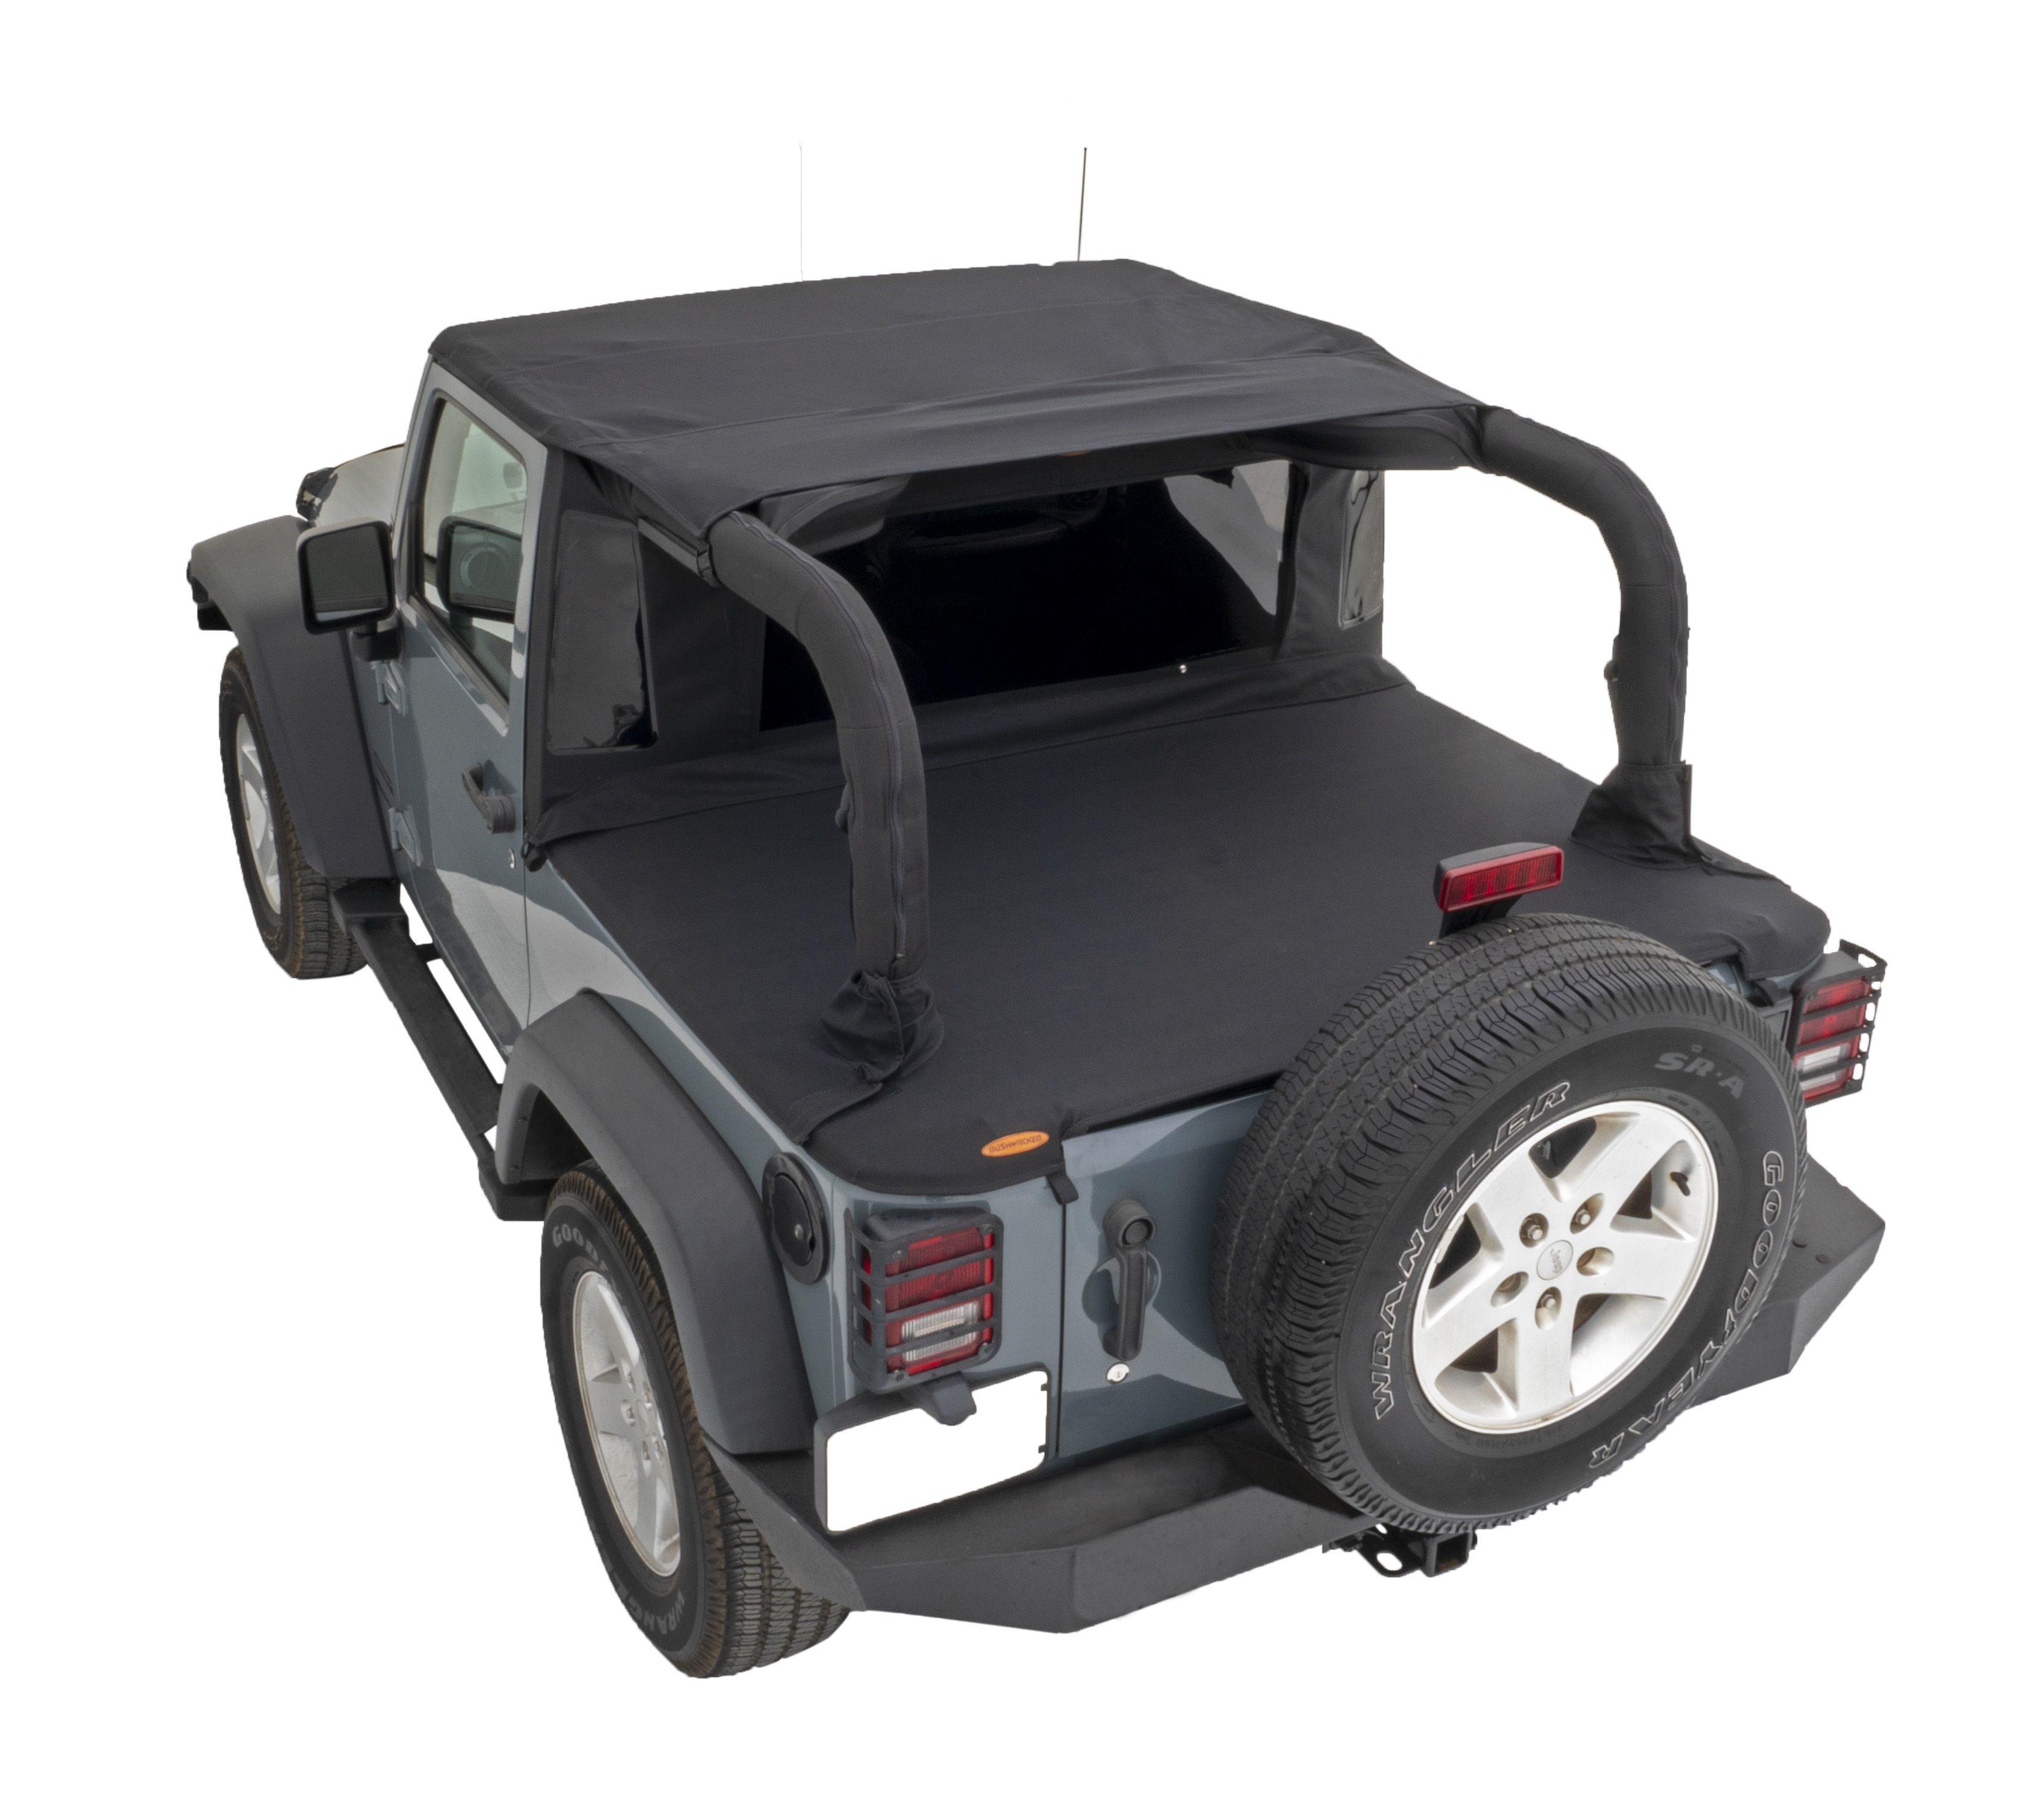 07-18 Jeep Wrangler JK 2Dr Trail Armor Soft Top